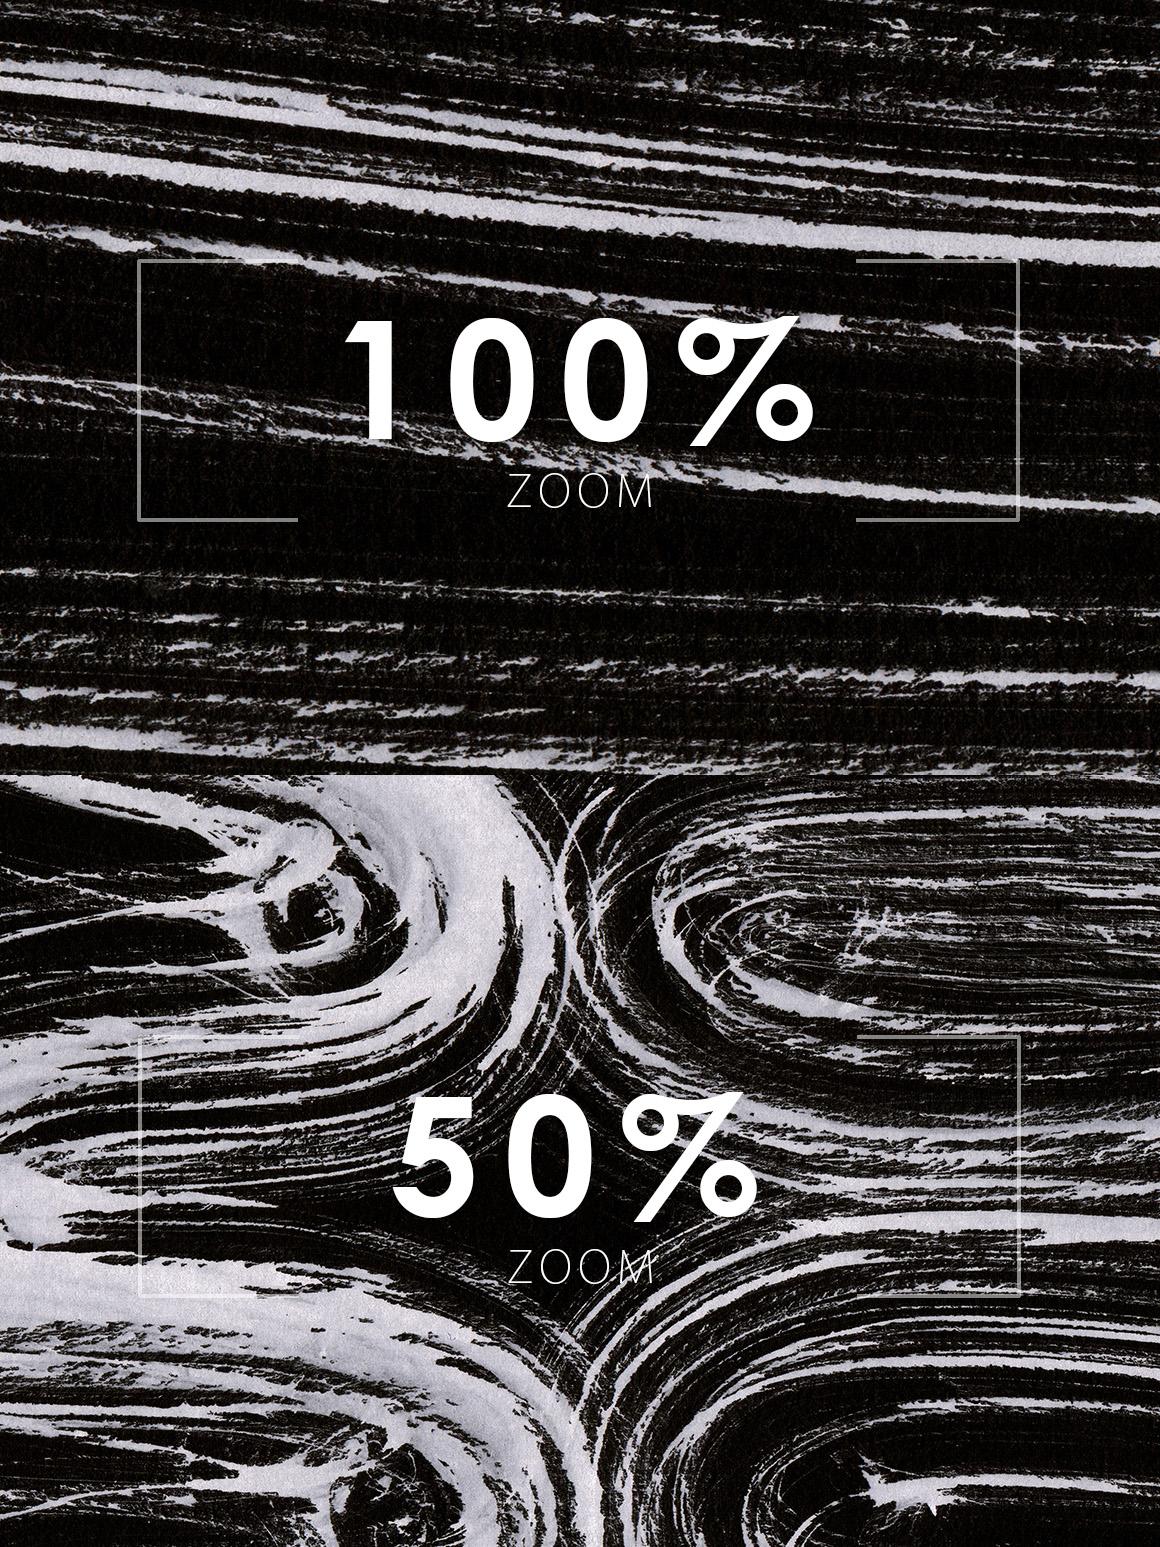 Inverted Black Ink Backgrounds Vol.2 example image 6